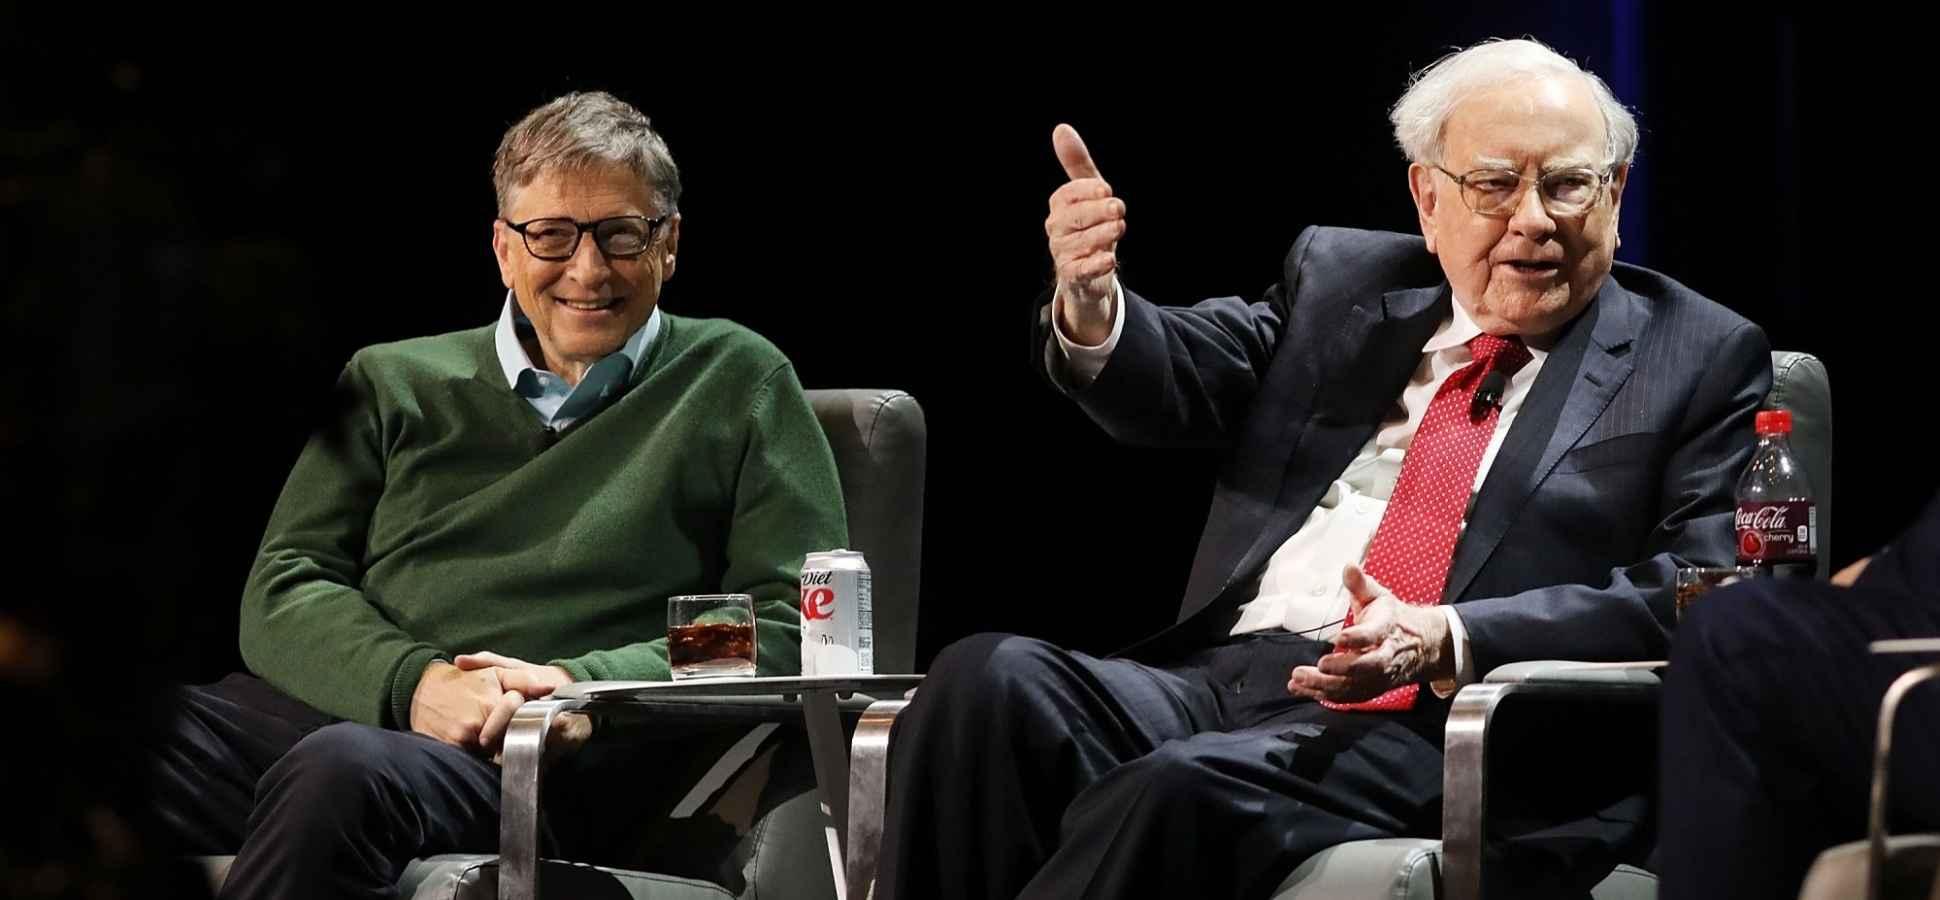 9 Books That Bill Gates, Jeff Bezos, and Warren Buffett Think You Should Read